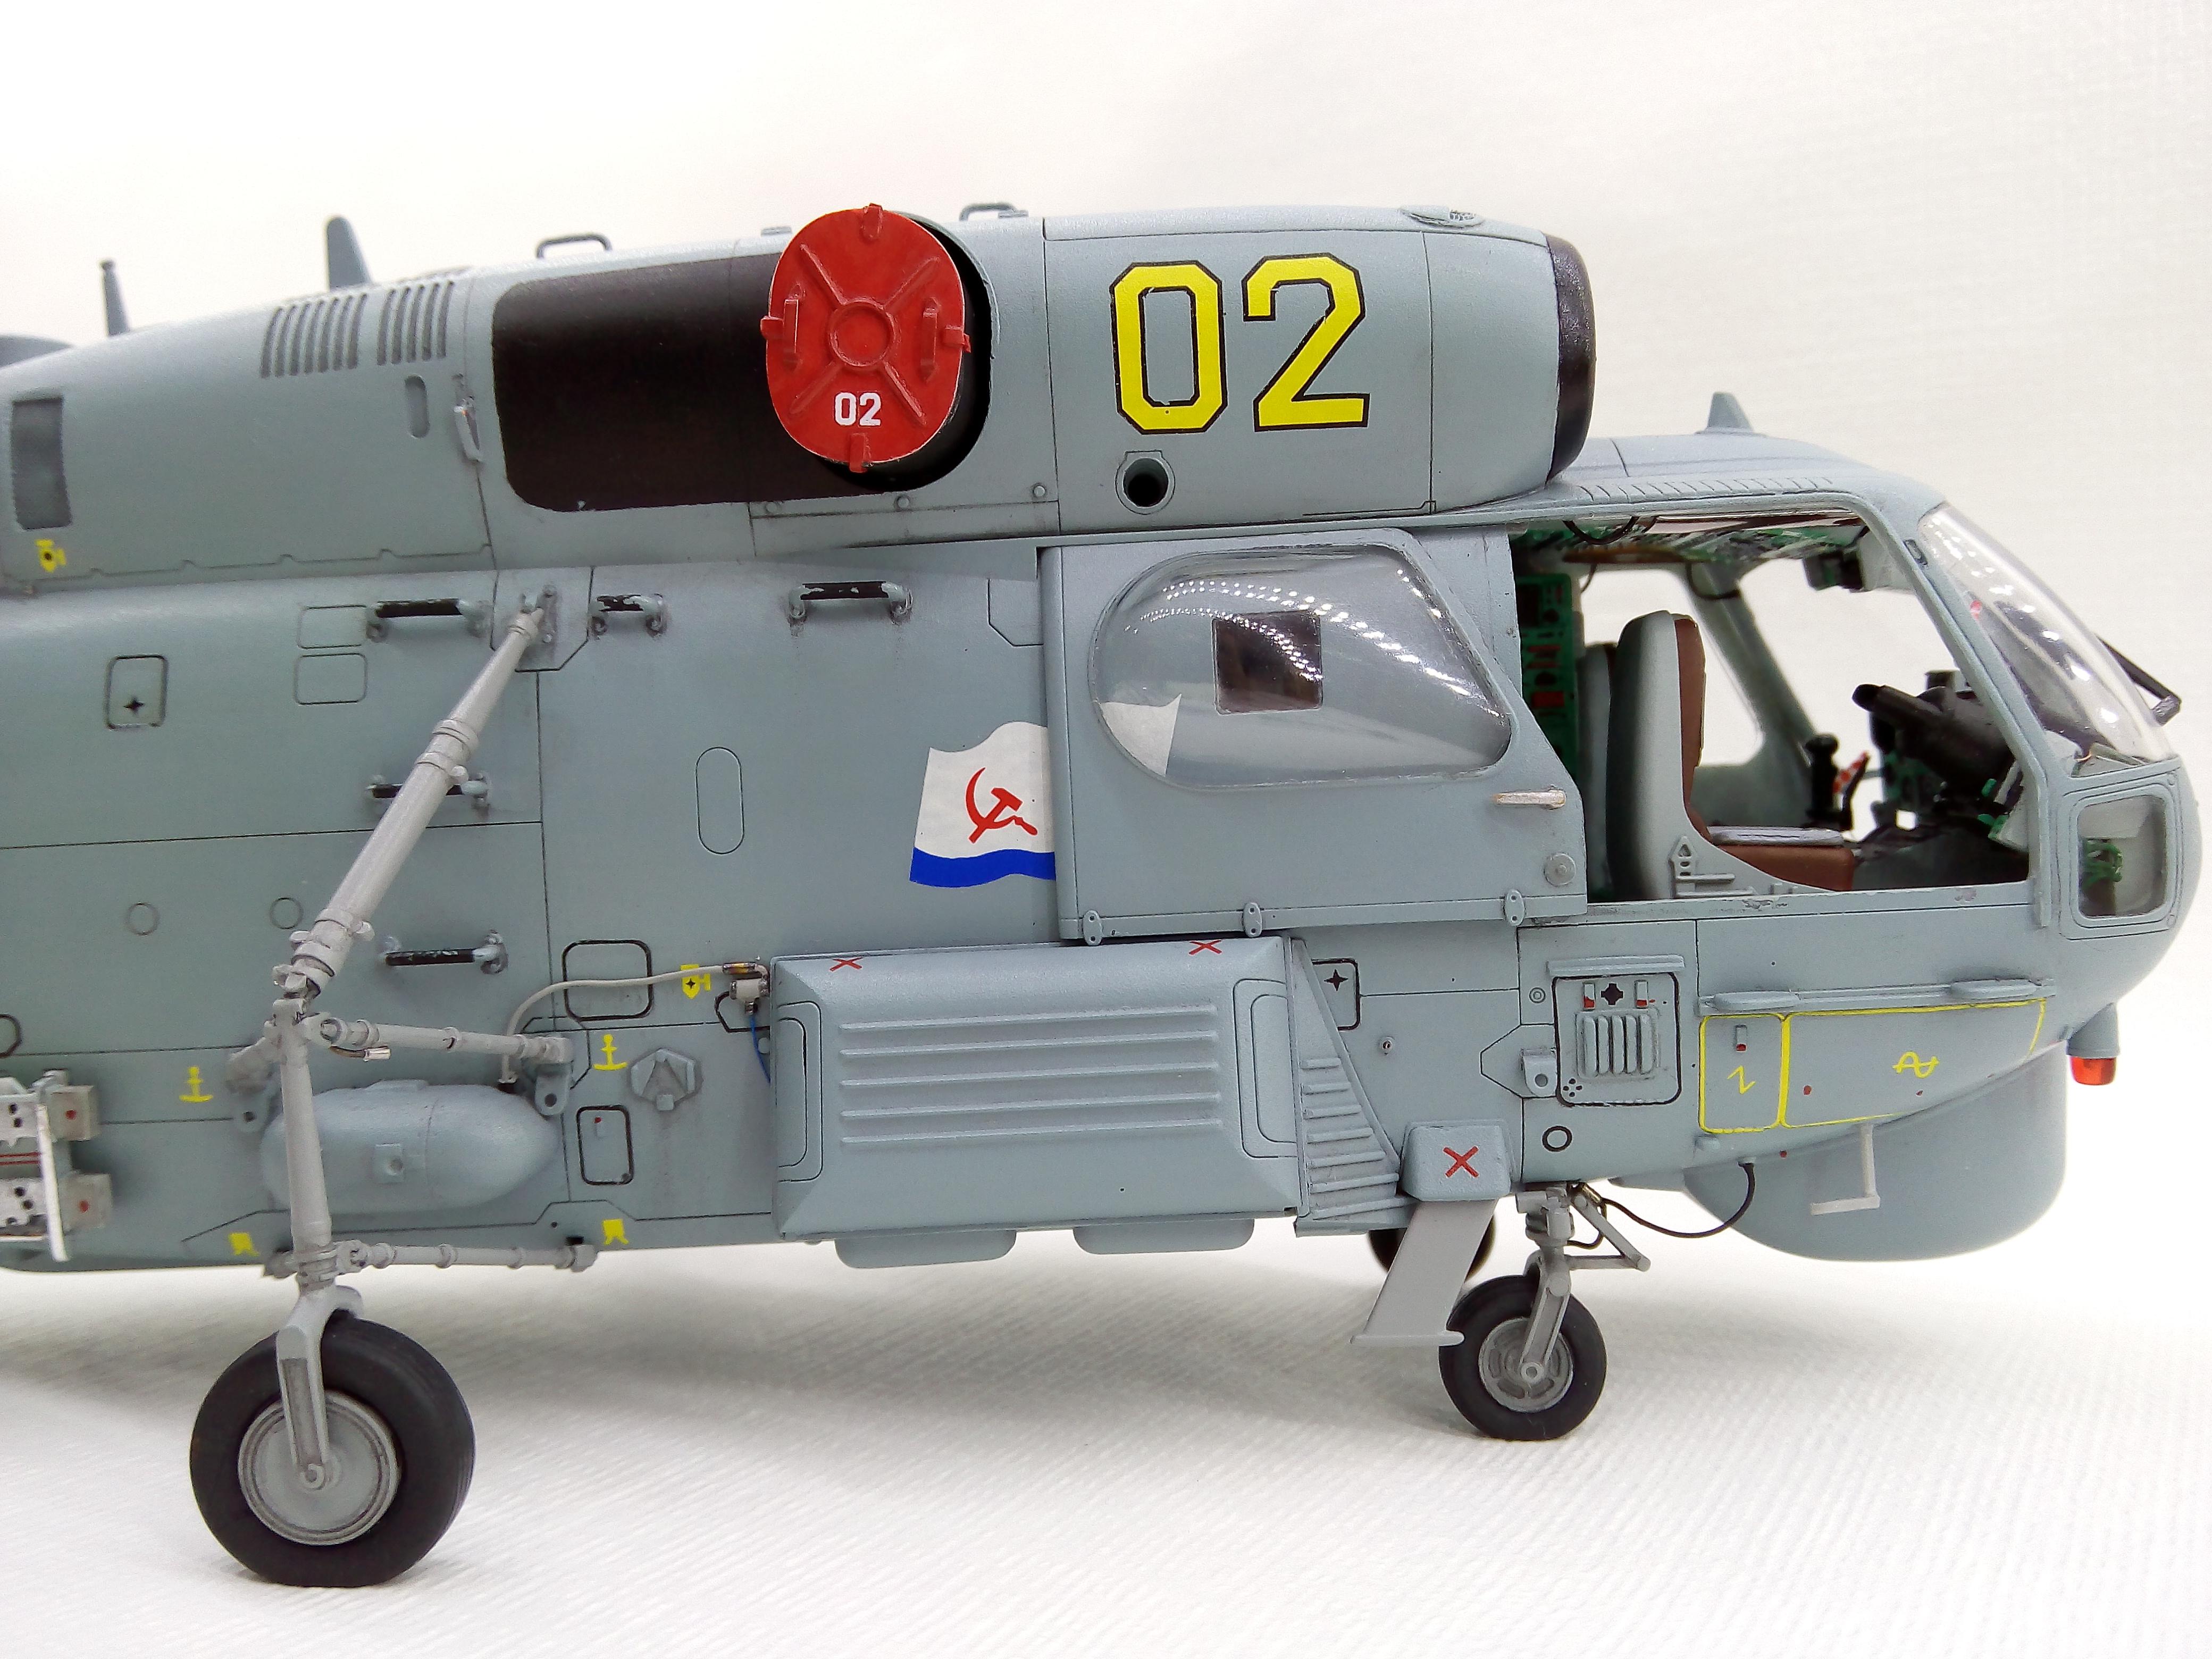 Ка-27ПЛ 1/48 HOBBYBOSS - Страница 4 69db0a038ad3